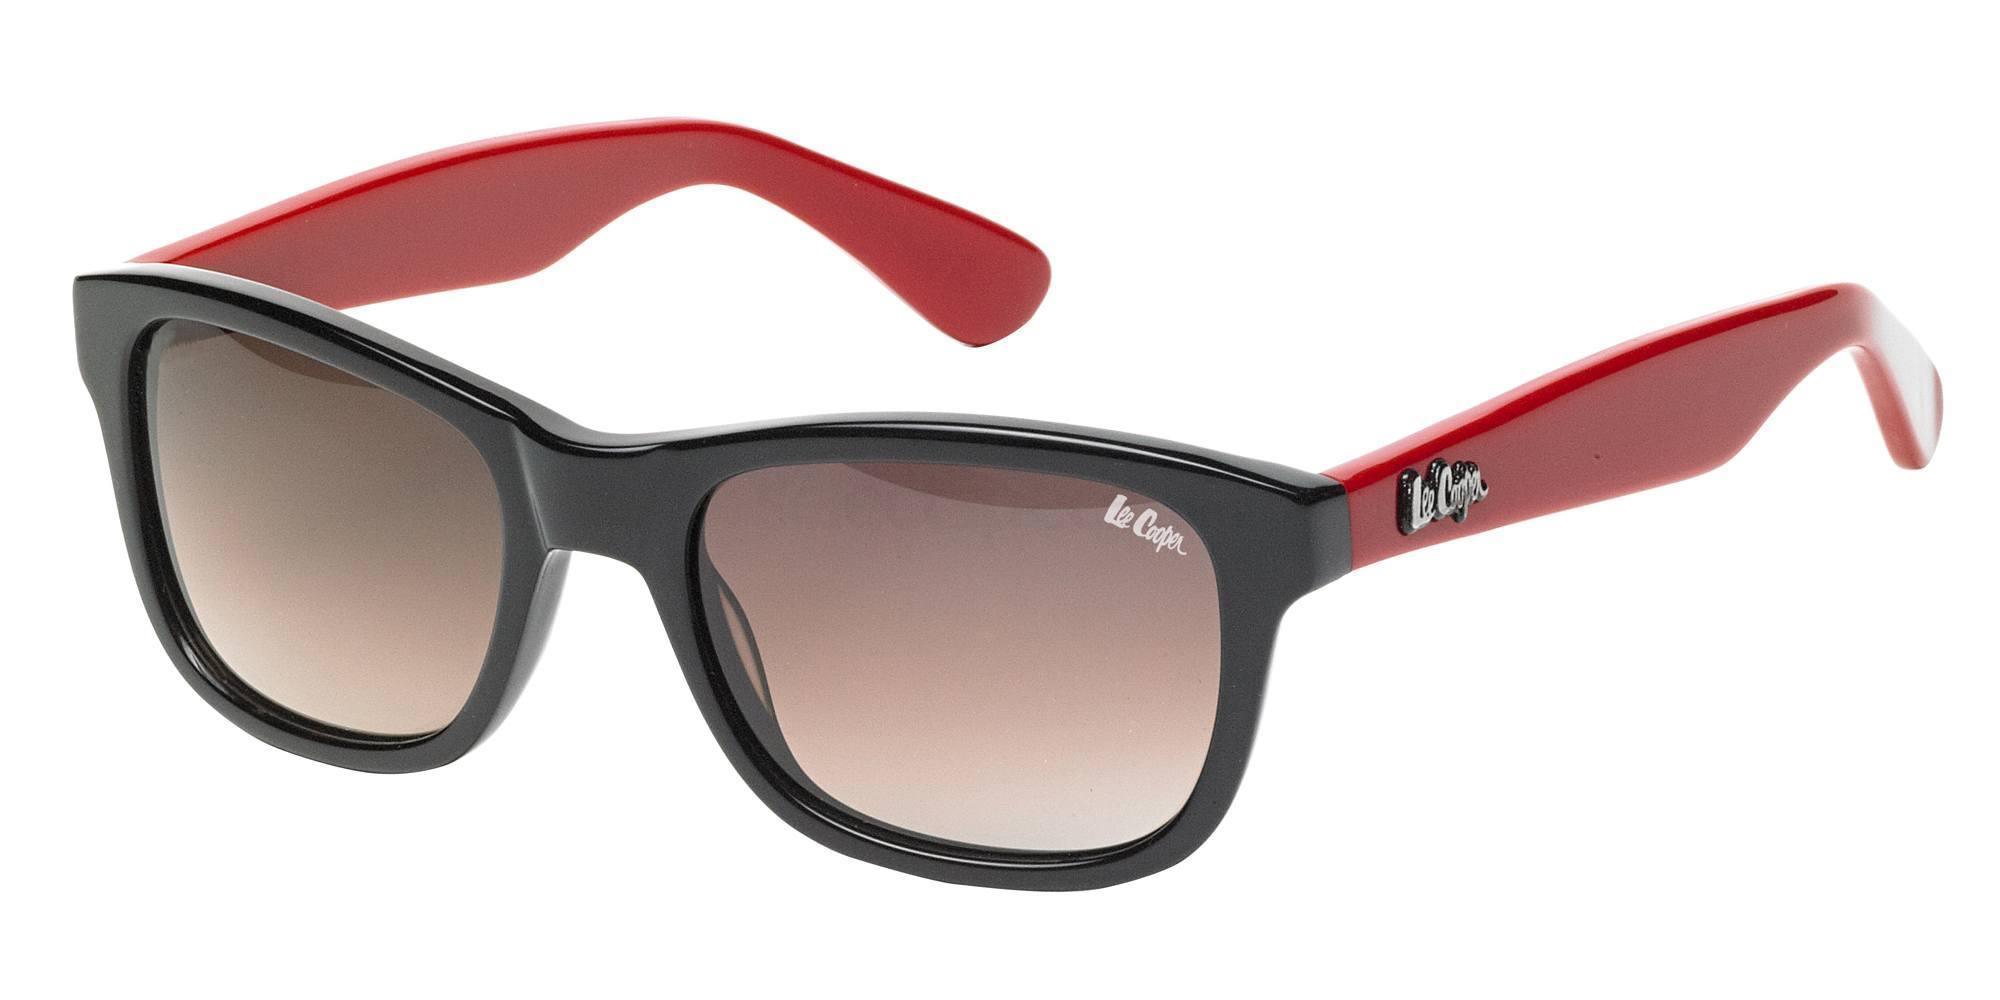 C1 SGLCK101 Sunglasses, Lee Cooper KIDS